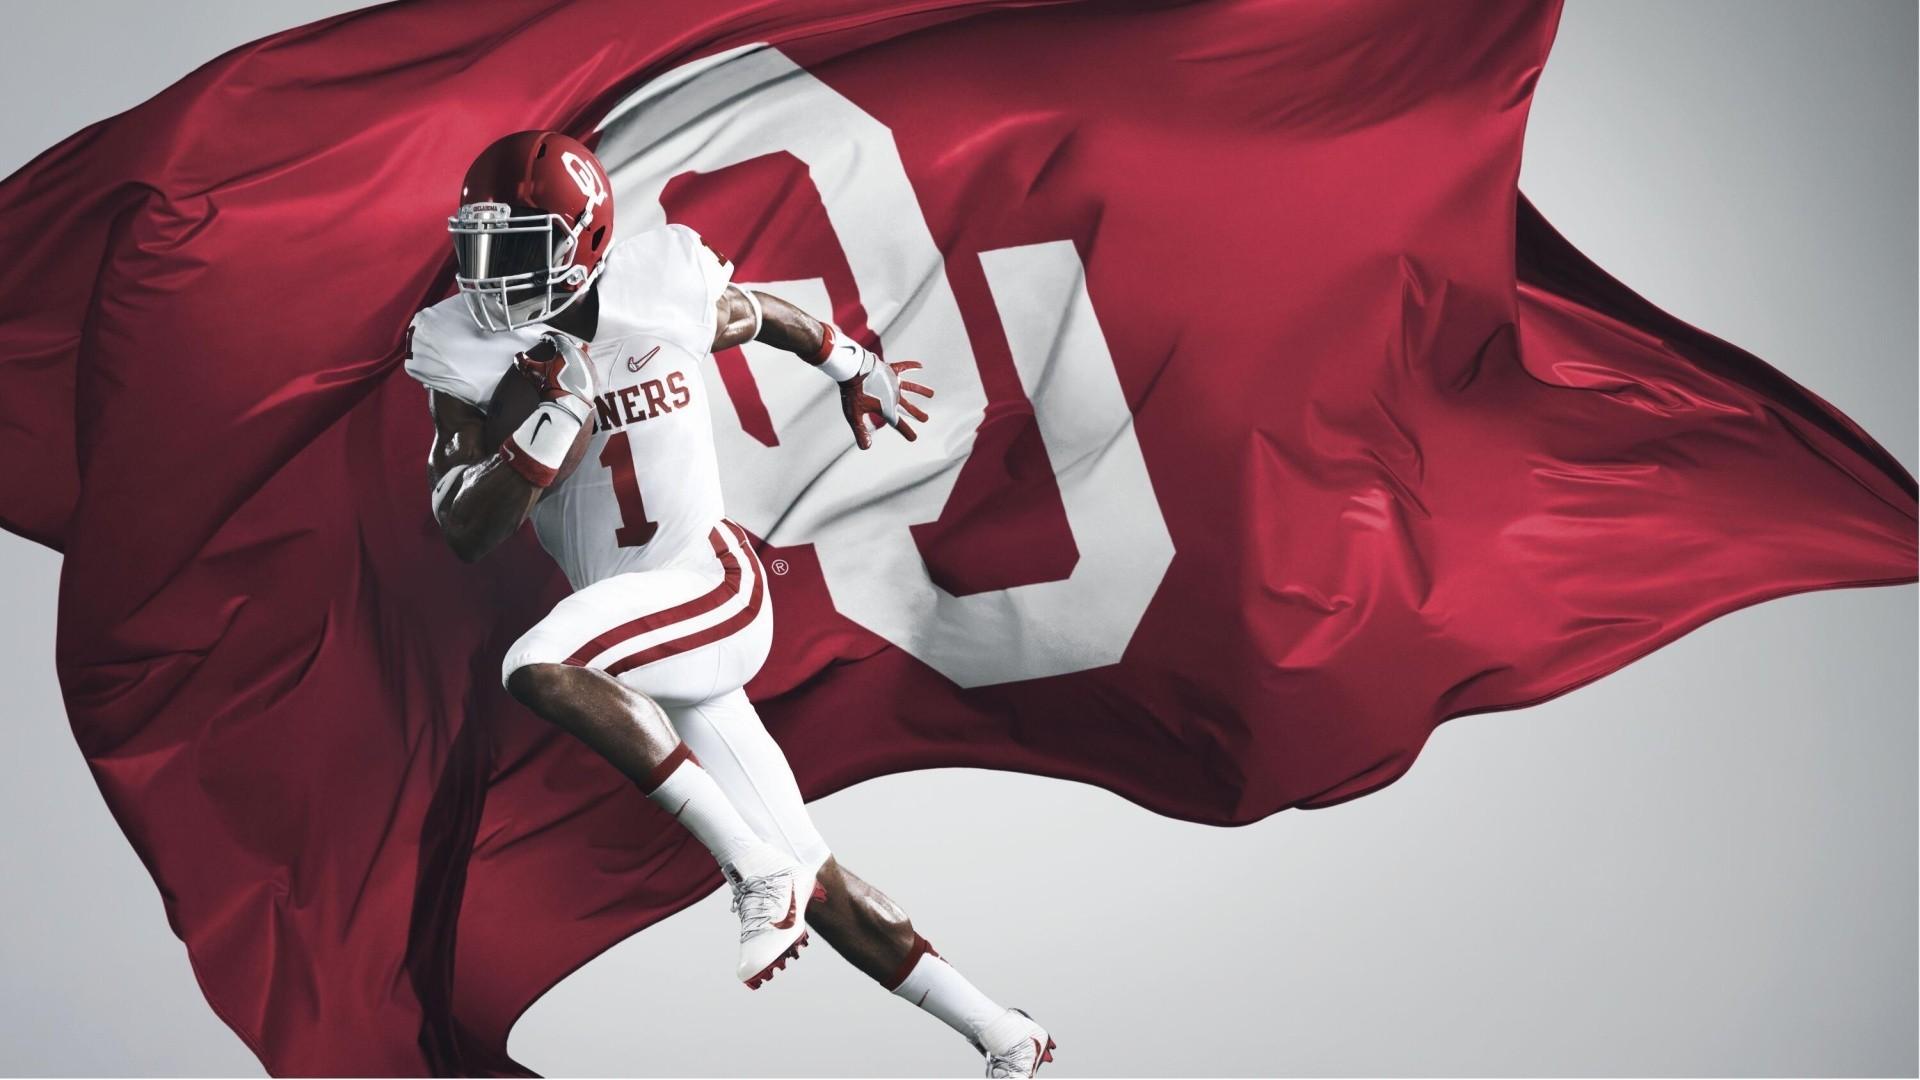 Nike Oklahoma Sooners Uniform Wallpaper New HD Wallpapers · OU  Wallpapers 2560×1600